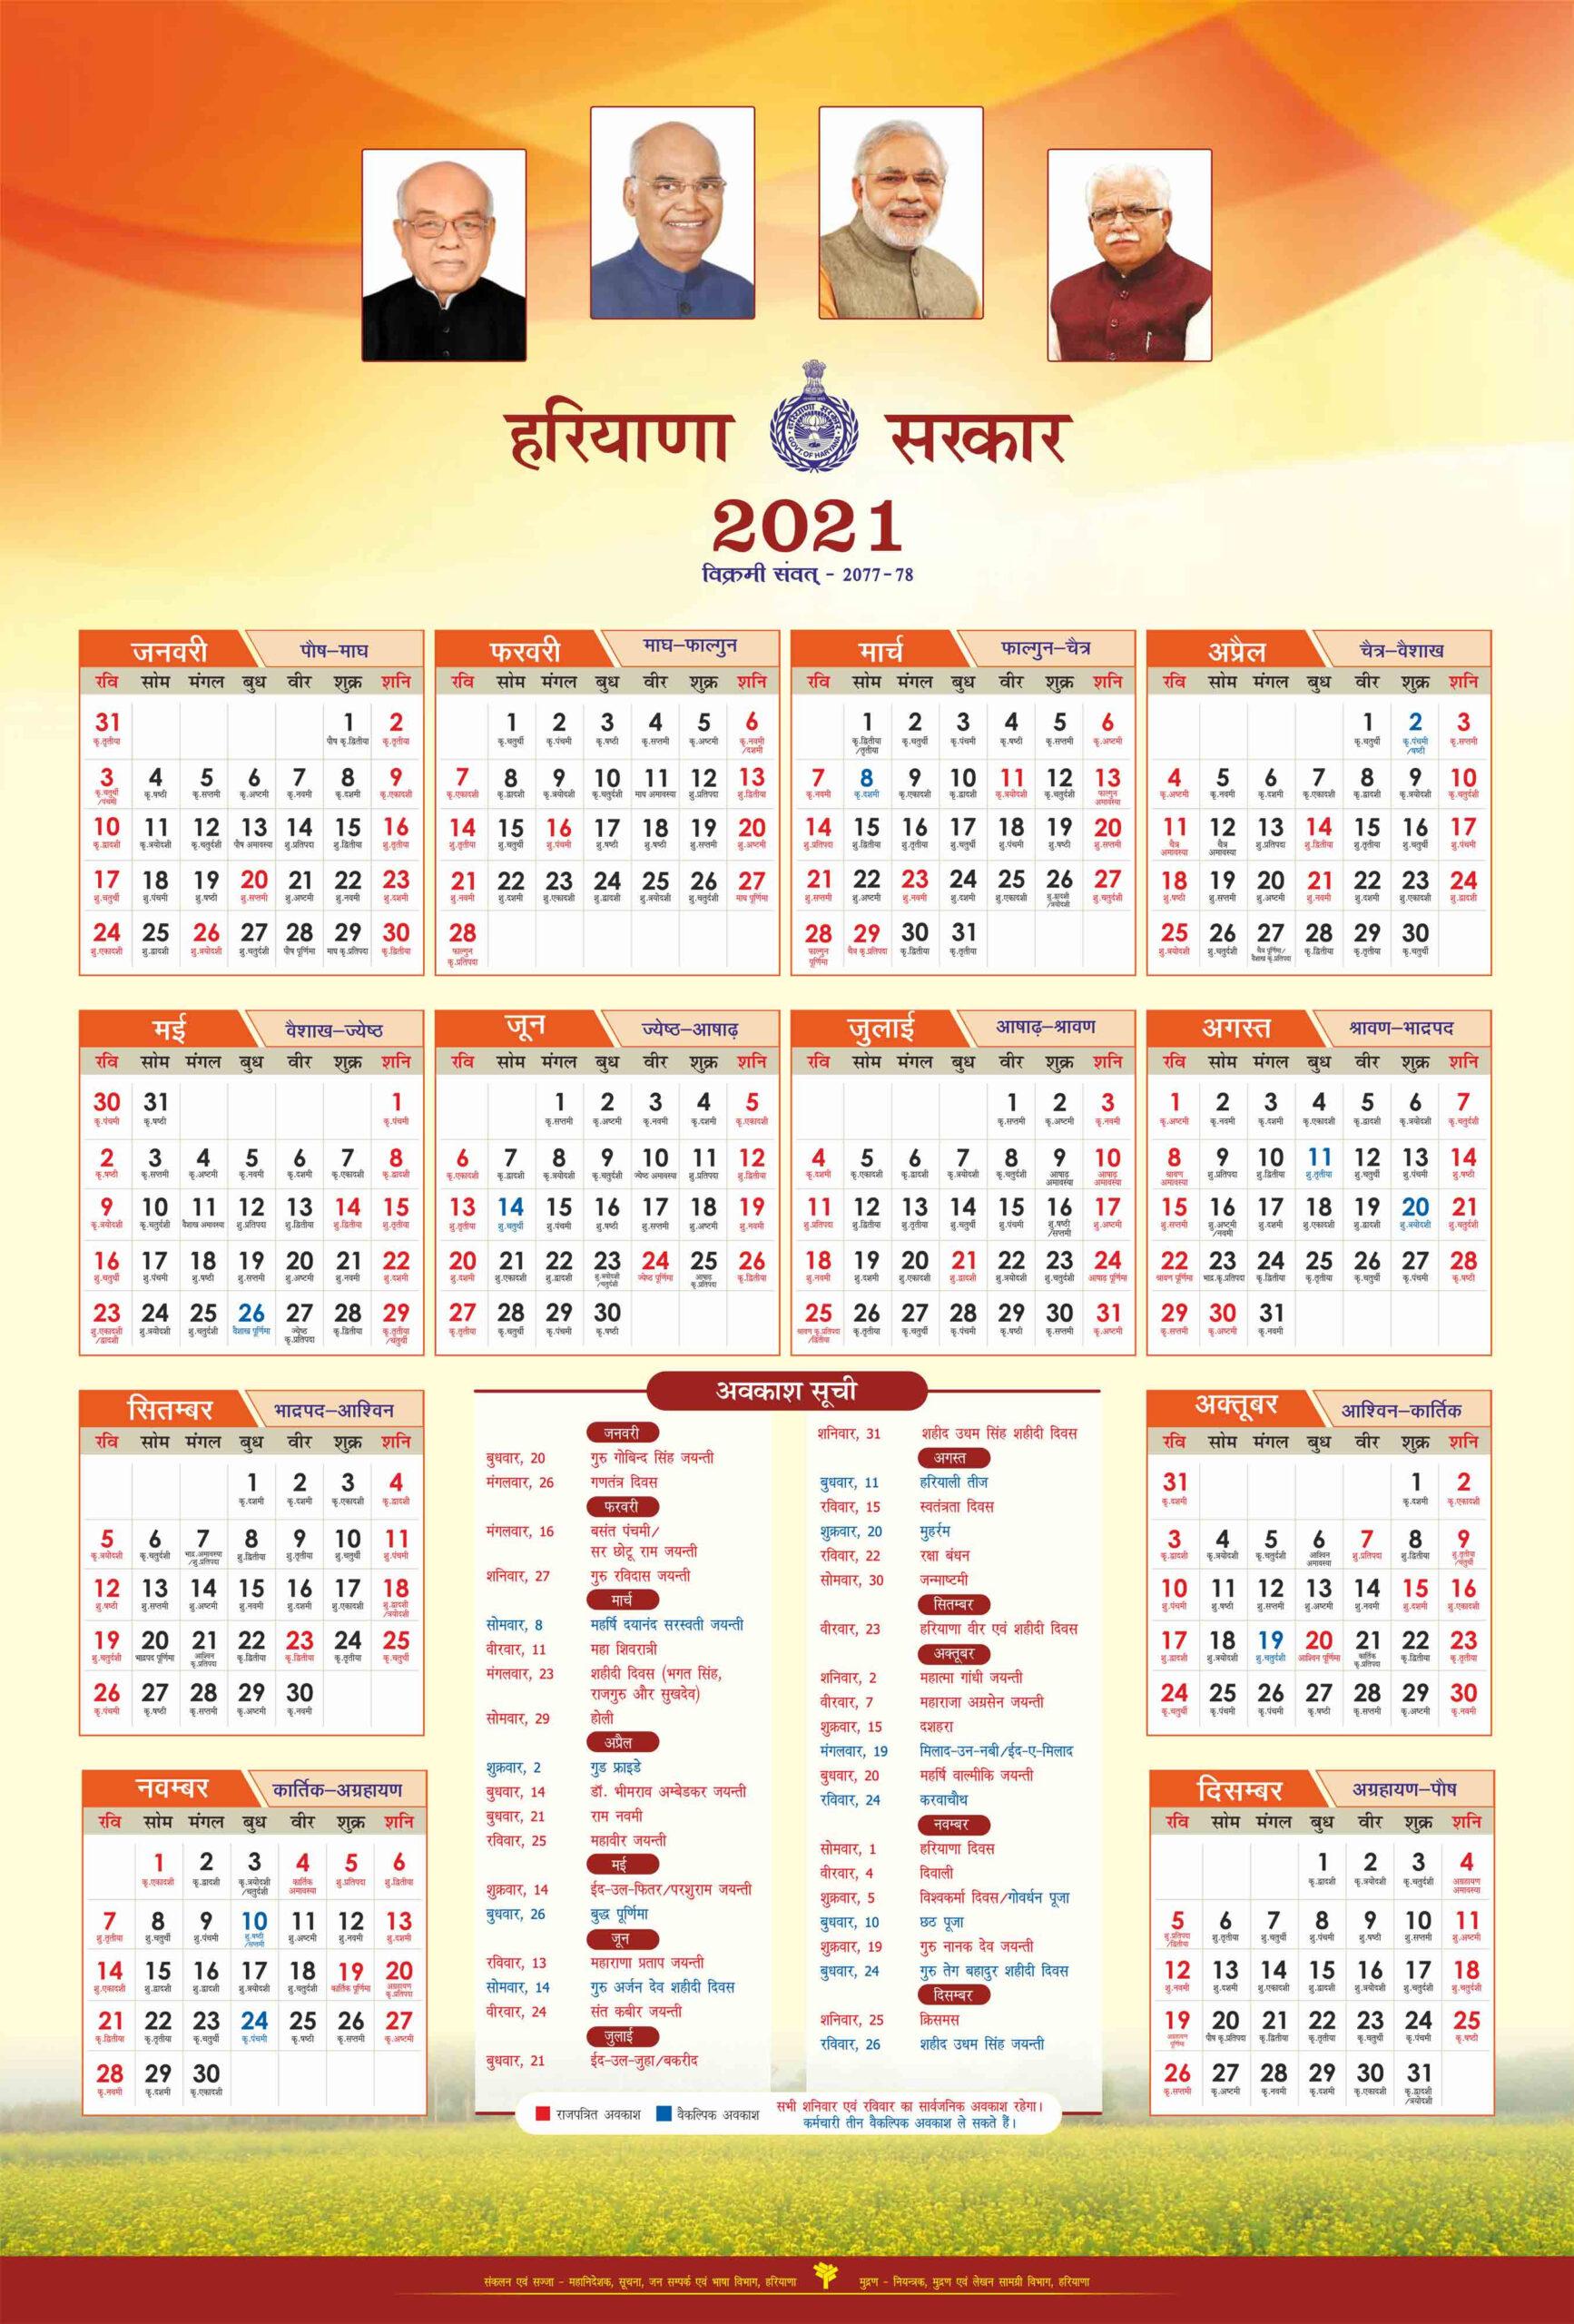 [Pdf] Haryana Govt Calendar 2021 Pdf Download | Seg  2021 Malayalam Calendar Pdf